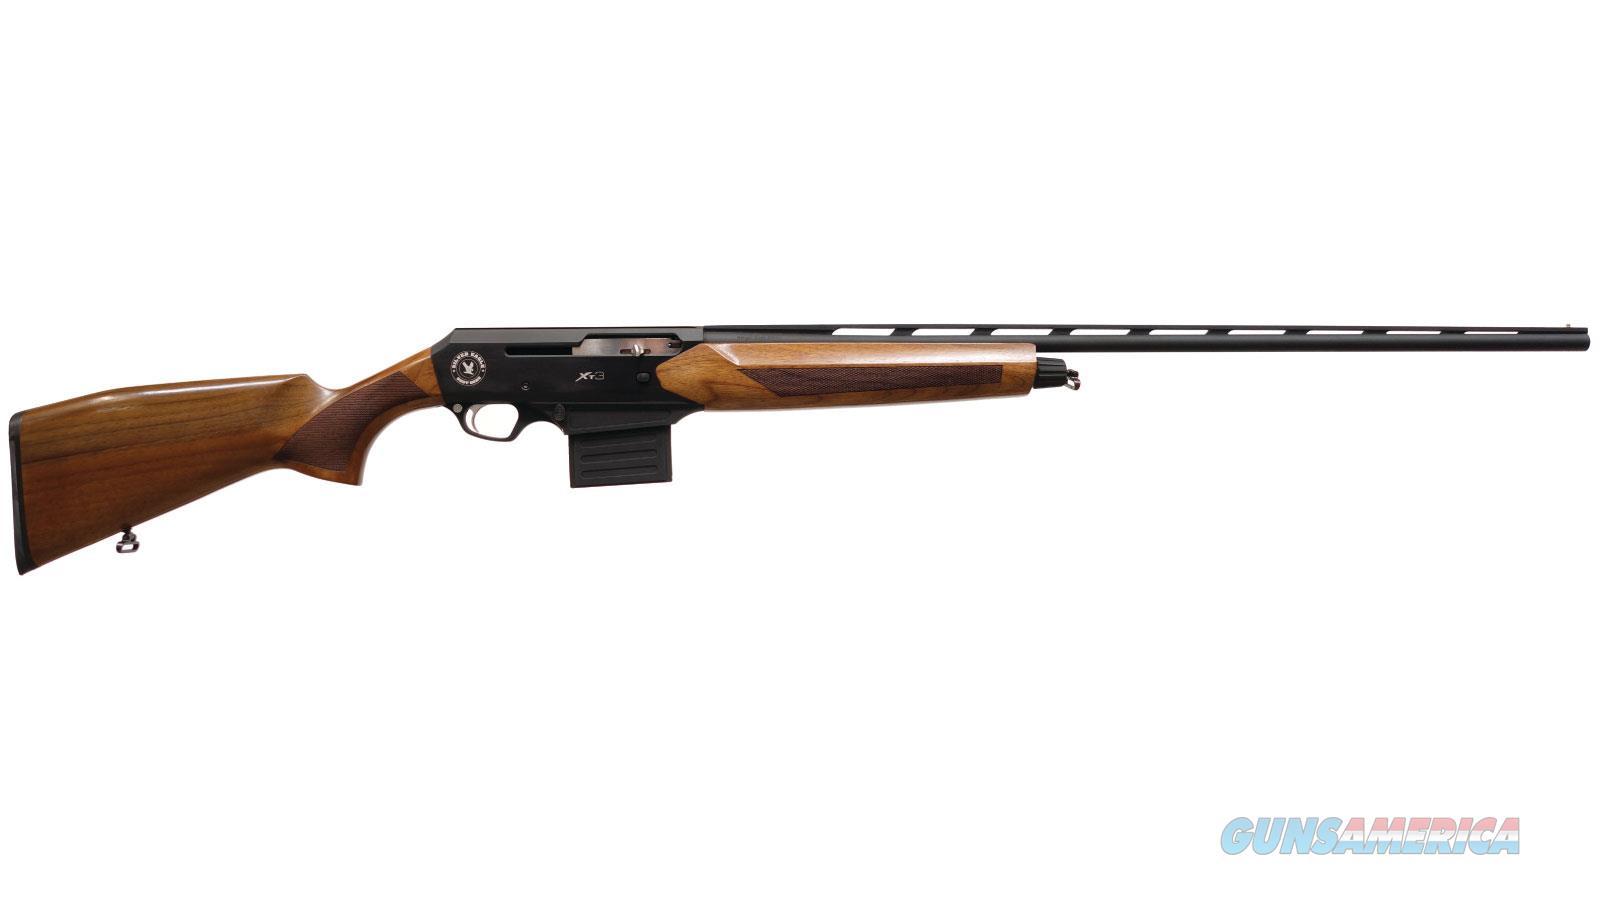 "Tr Imports Xt3 Field 410 28"" 5Rd XT3B28  Guns > Shotguns > TU Misc Shotguns"